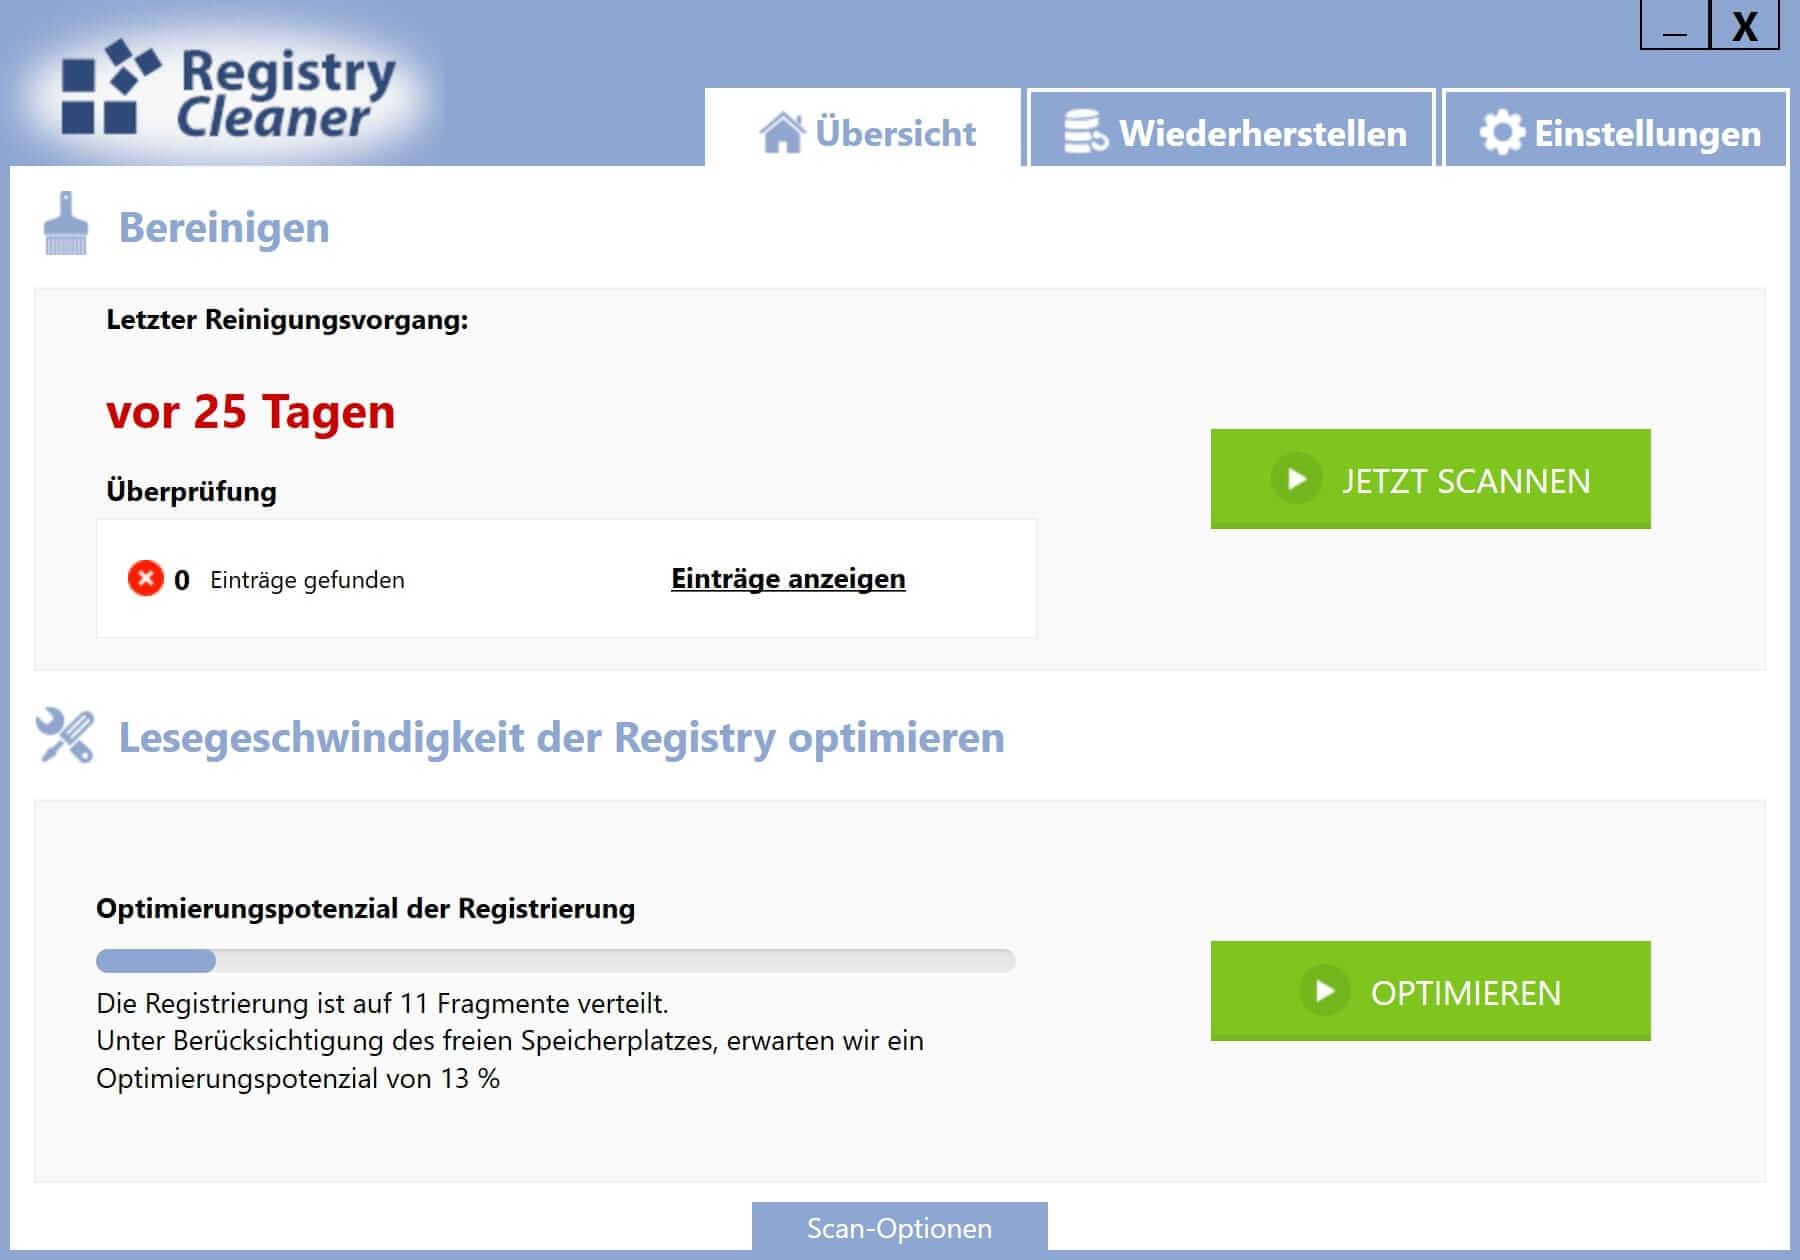 Registry defragmentieren - Optimierungspotenzial